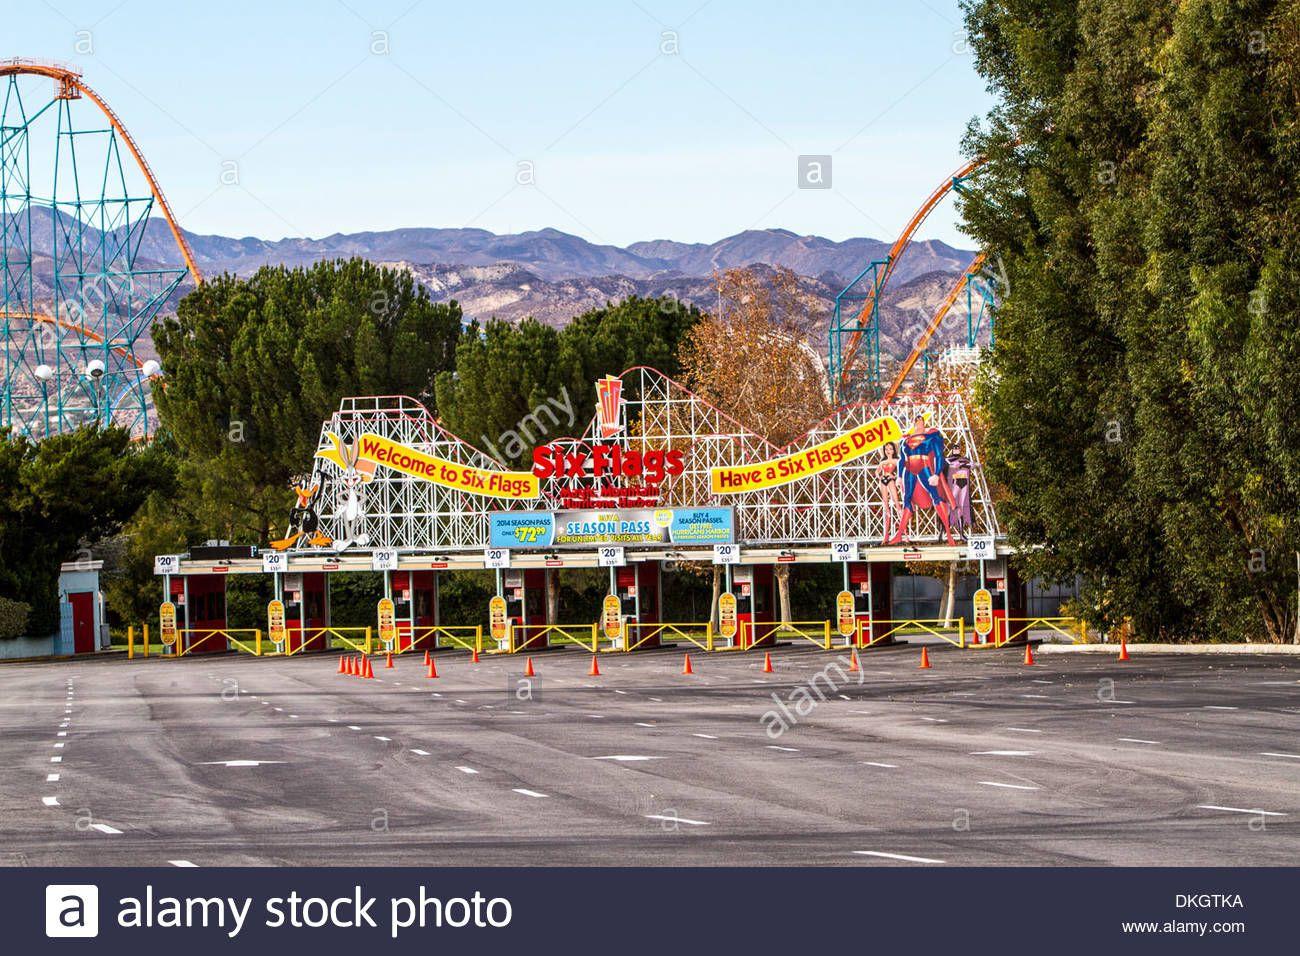 The Entrance To Six Flags Magic Mountain In Valencia California Stock Photo Valencia California Photo Six Flags